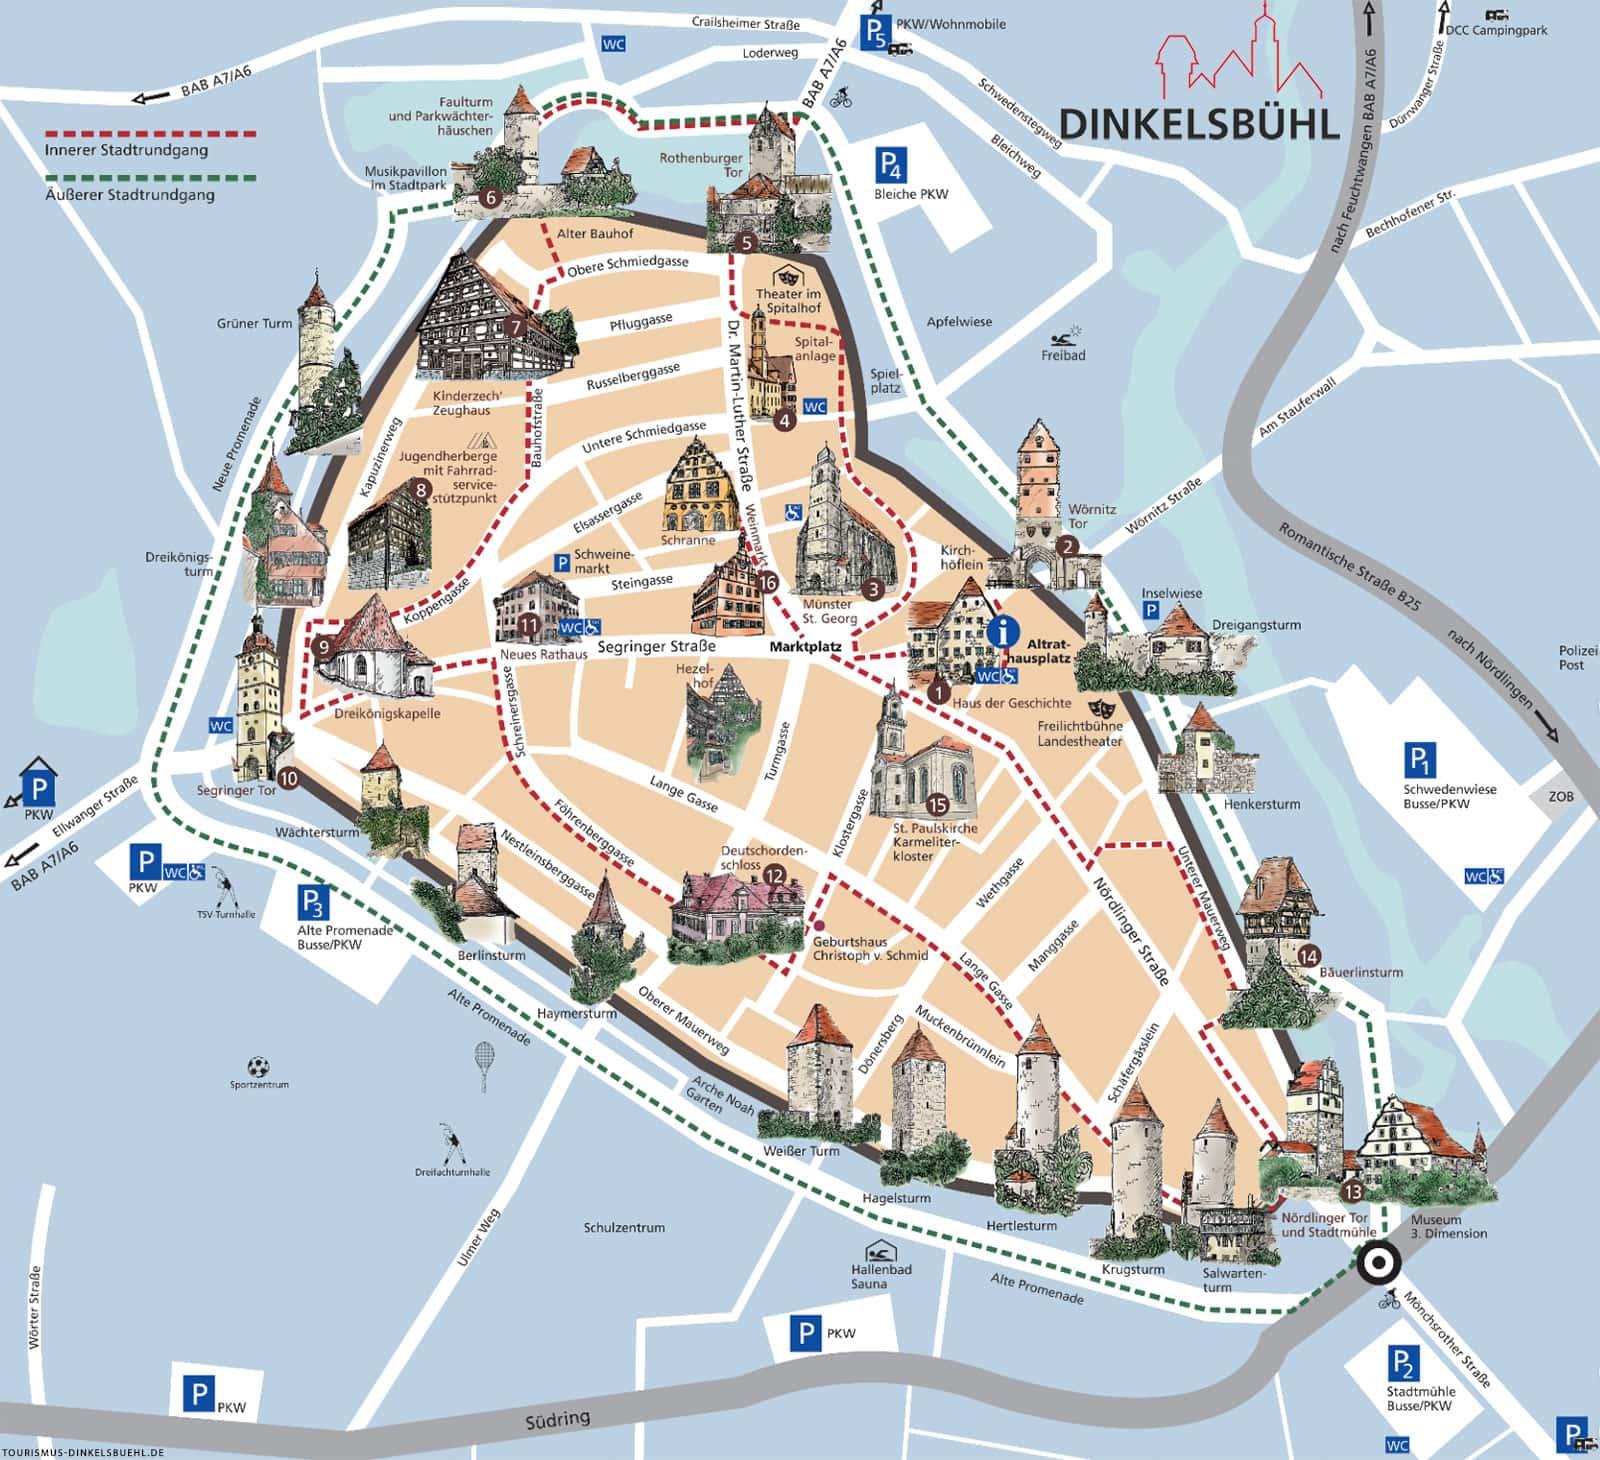 Dinkelsbühl, Karte, Stadtplan, Sehenswürdigkeiten, Download, Reisebericht, Stadtrundgang